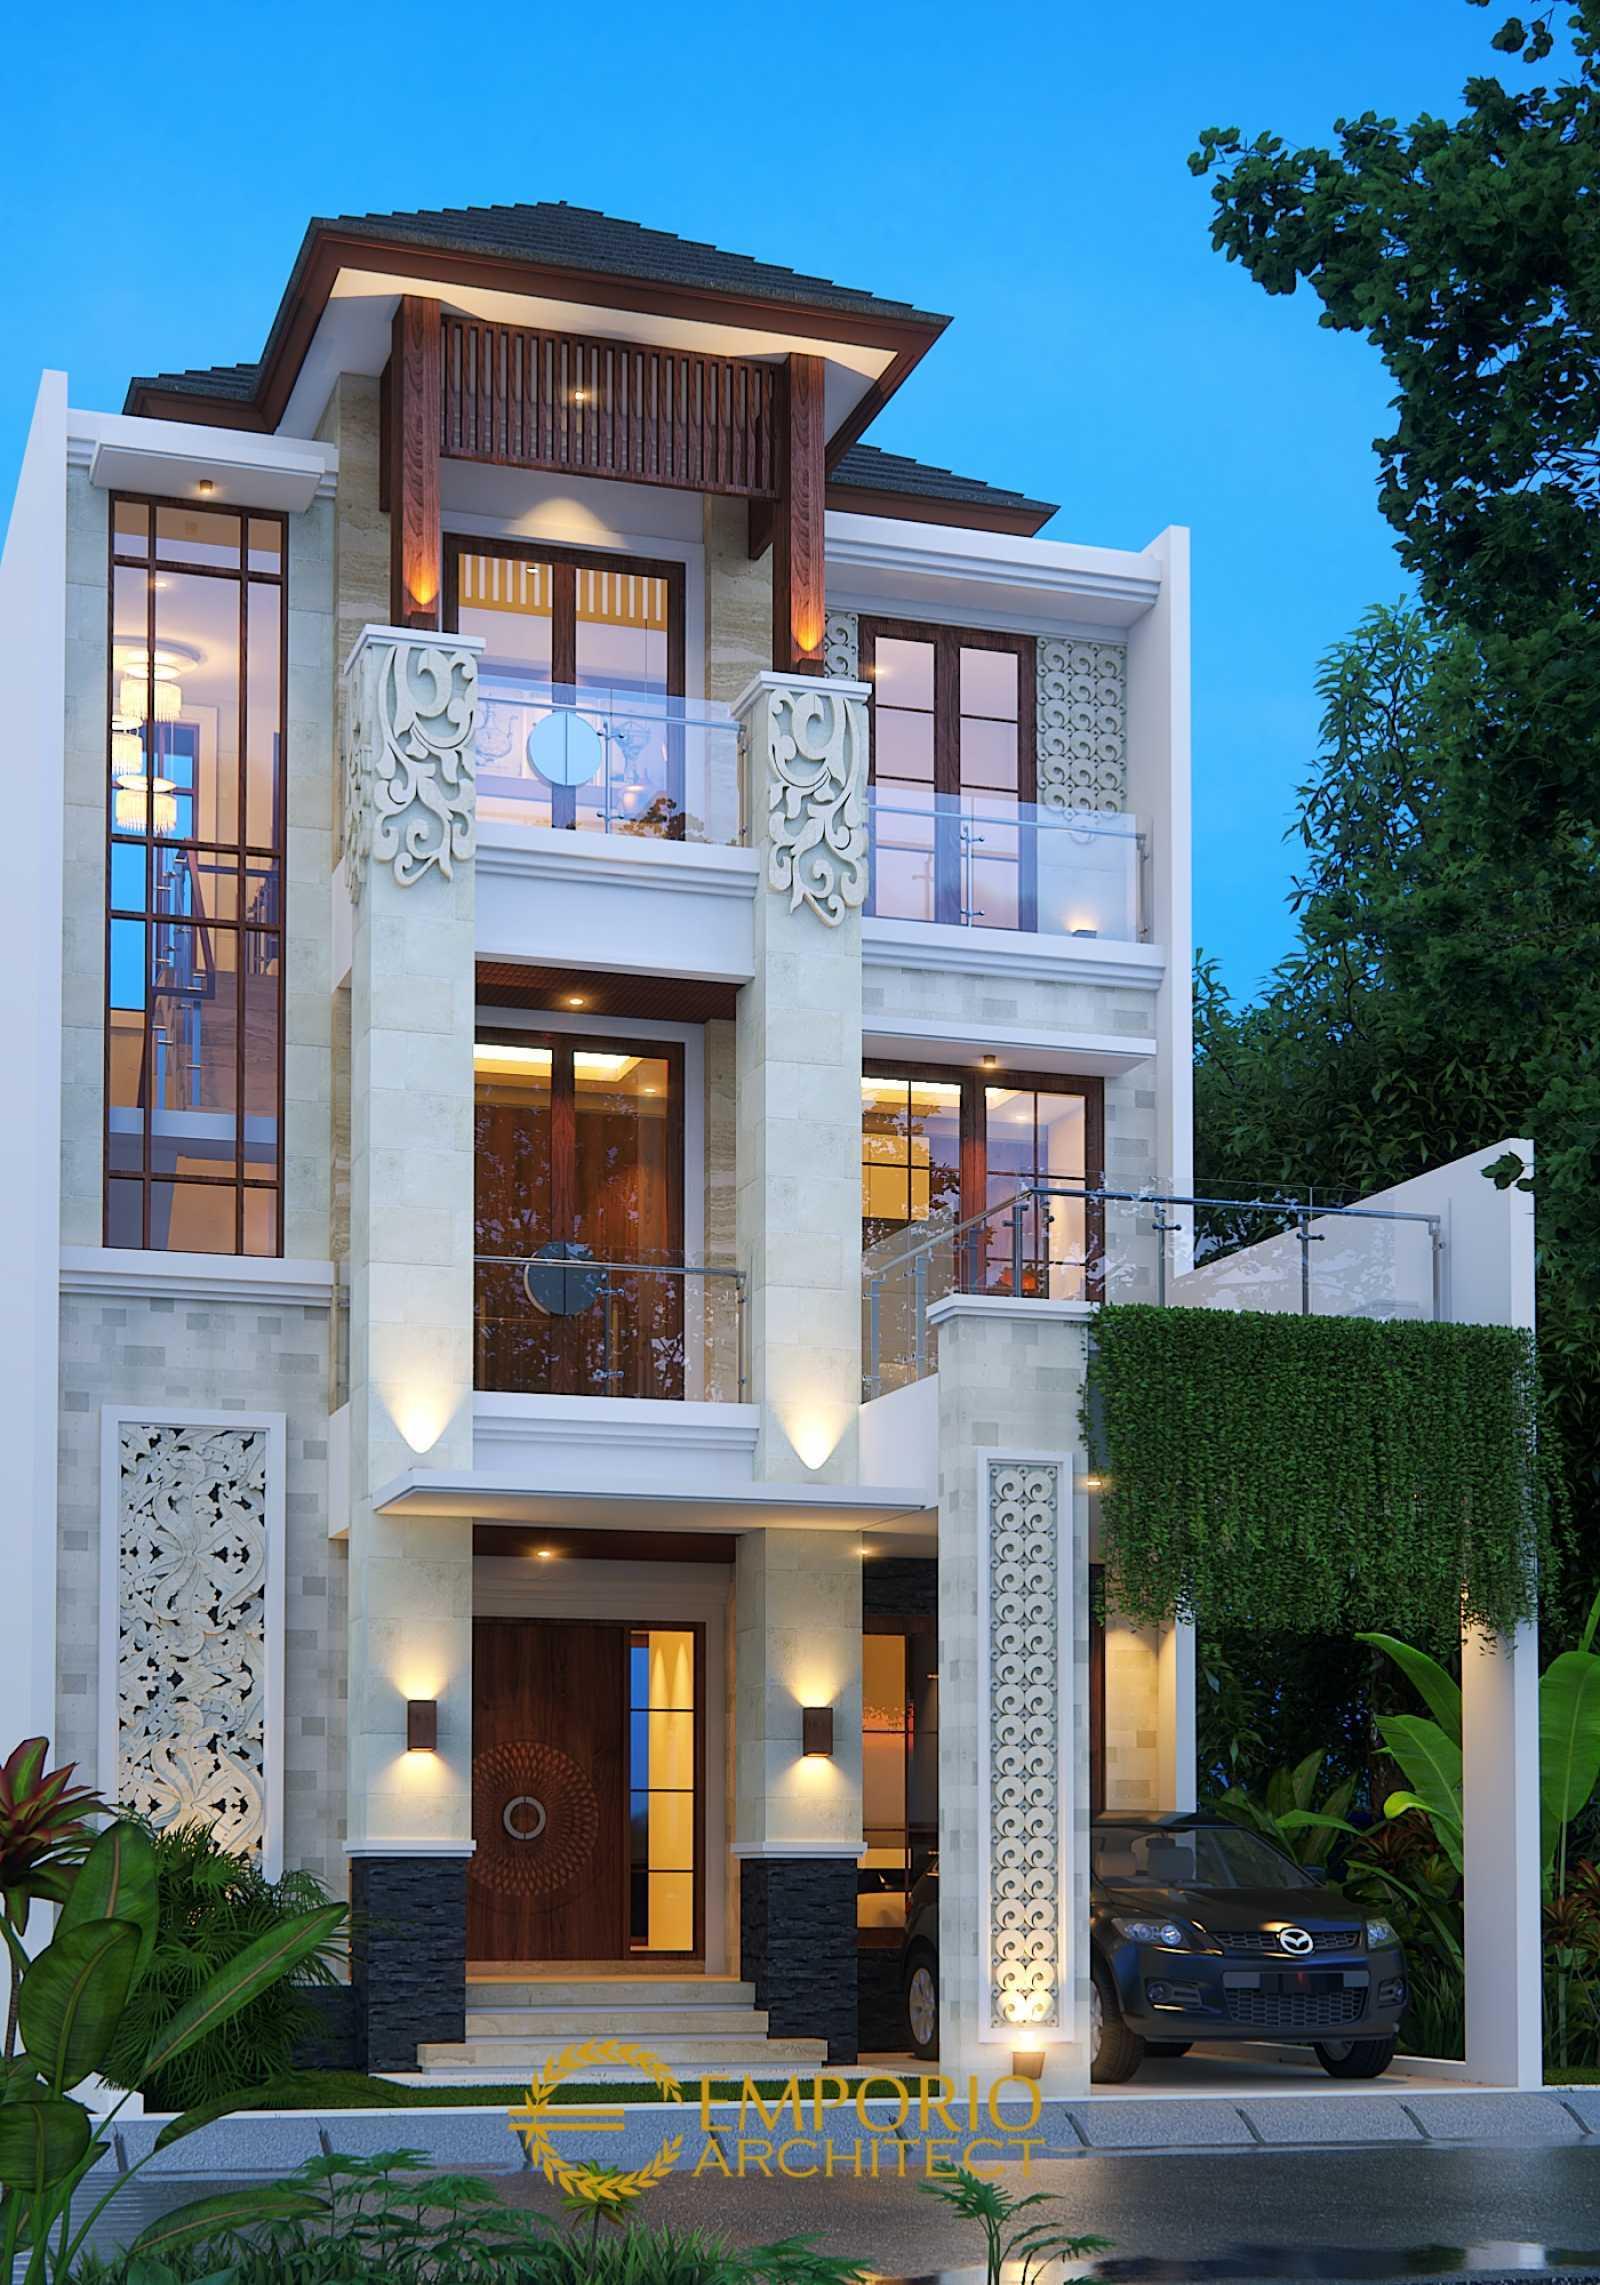 Emporio Architect Jasa Arsitek Batam Desain Rumah Villa Bali Tropis 630 @ Batam Batam, Kota Batam, Kepulauan Riau, Indonesia Batam, Kota Batam, Kepulauan Riau, Indonesia Emporio-Architect-Jasa-Arsitek-Batam-Desain-Rumah-Villa-Bali-Tropis-630-Batam Tropical  78770